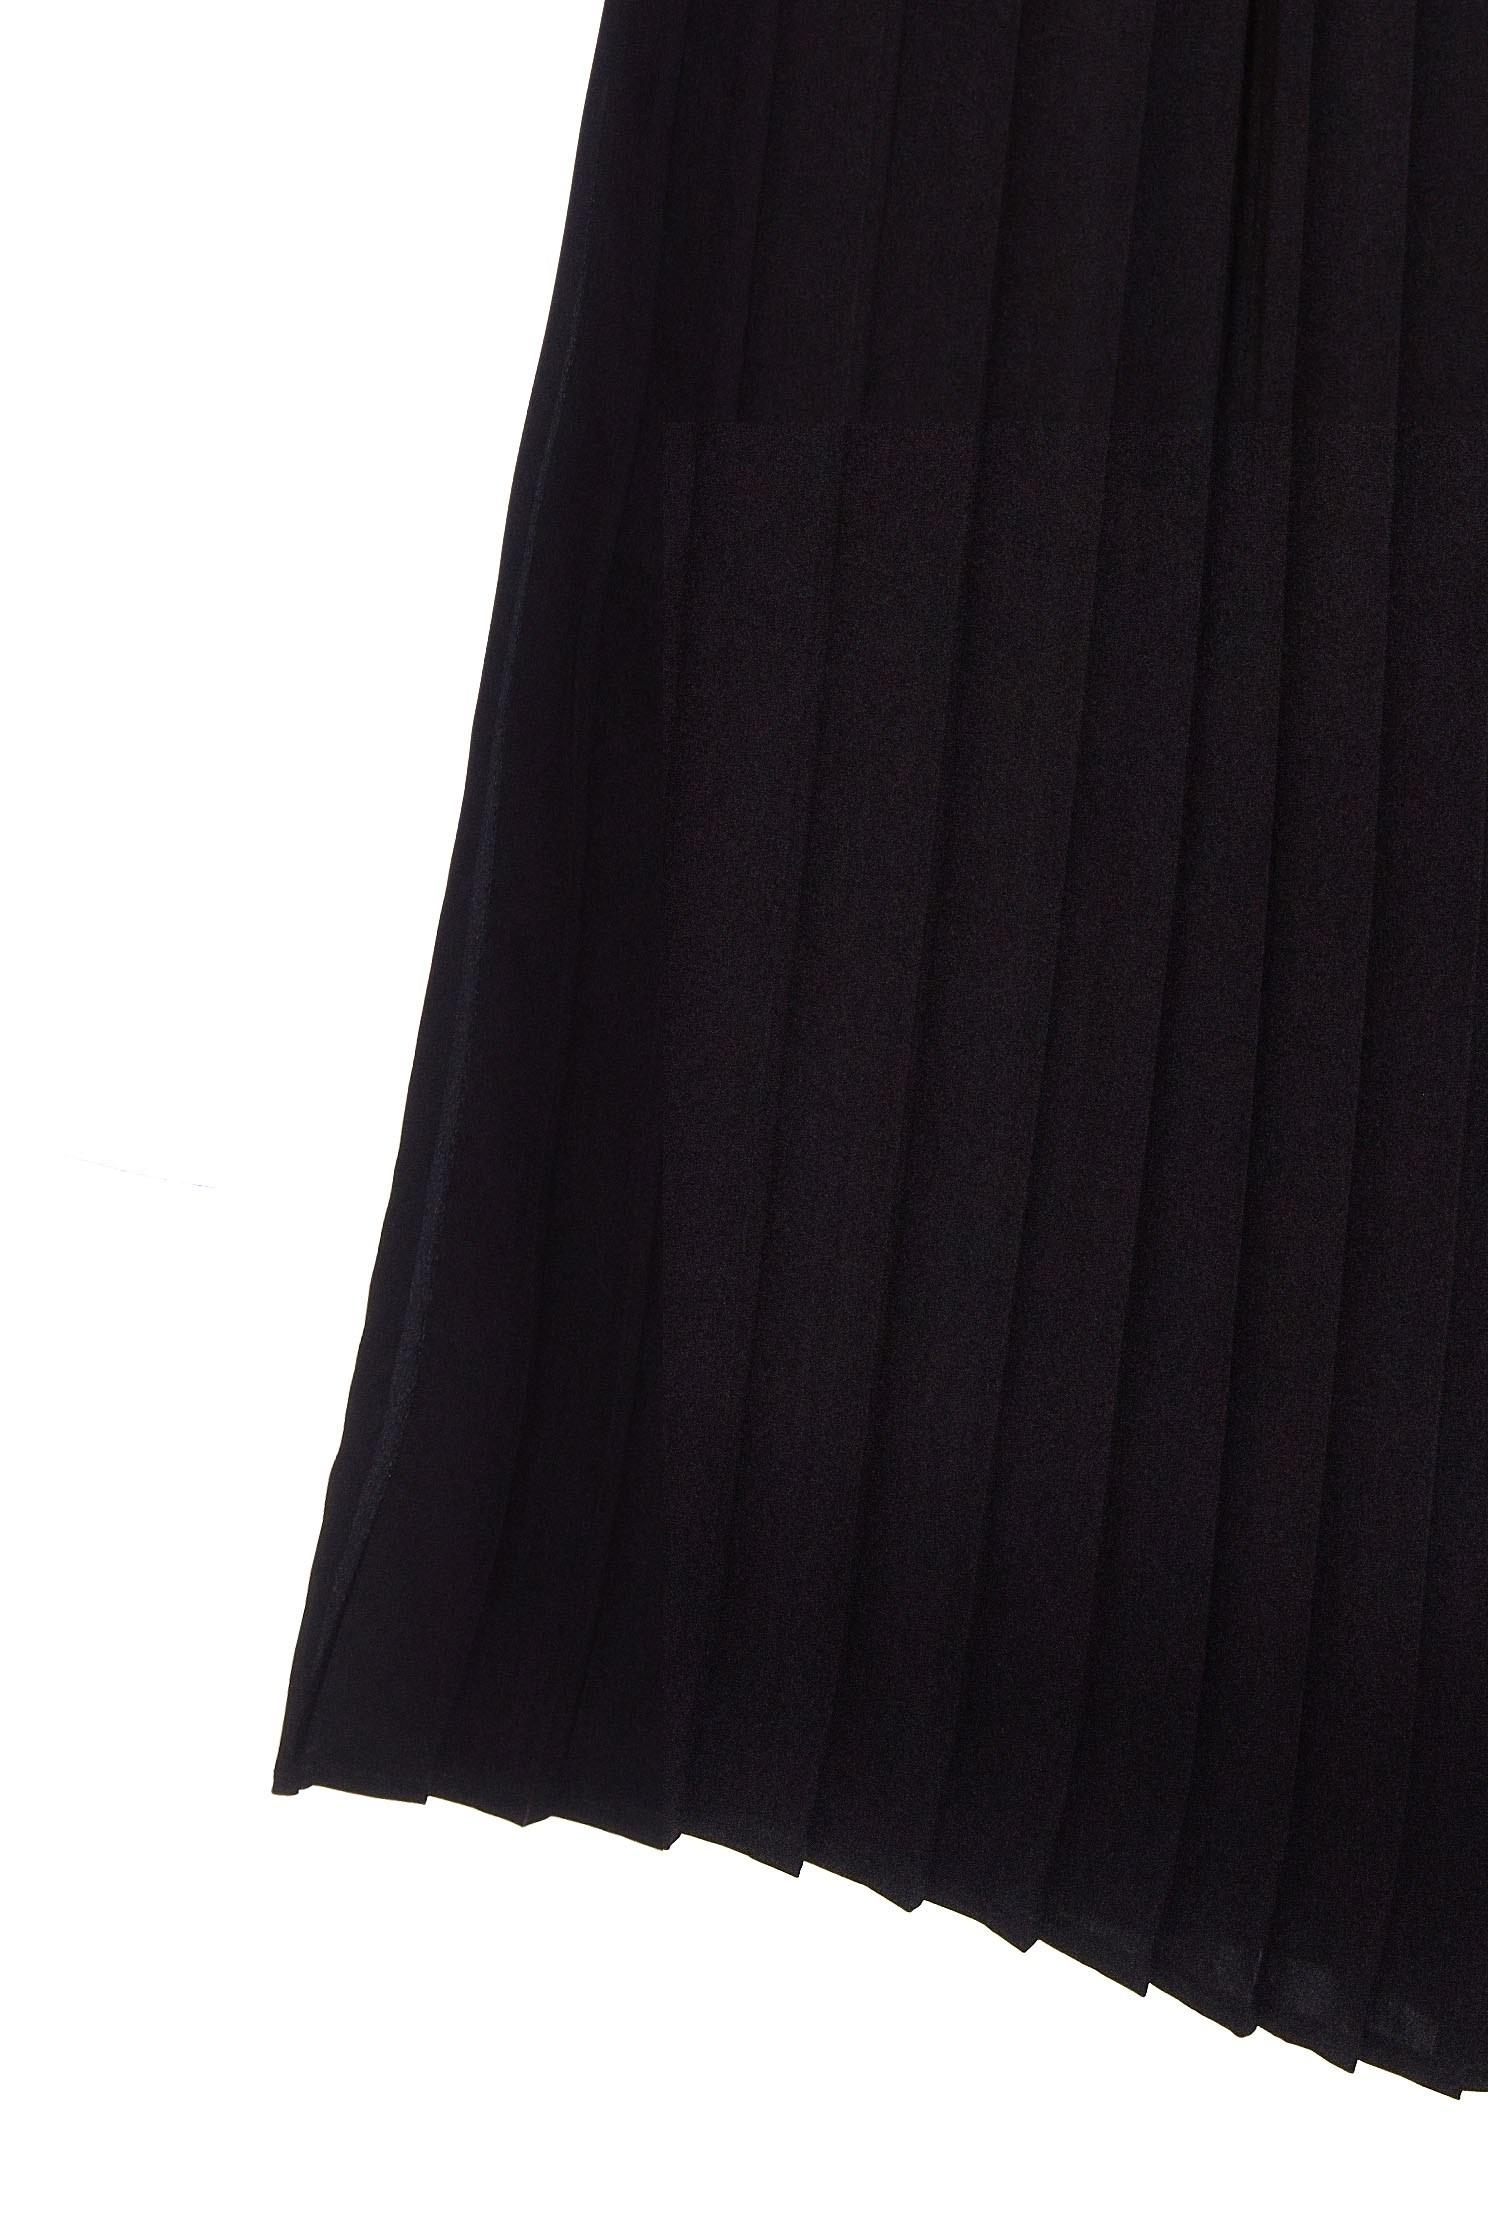 Chic pleated trouser,pants,chiffon,blackpants